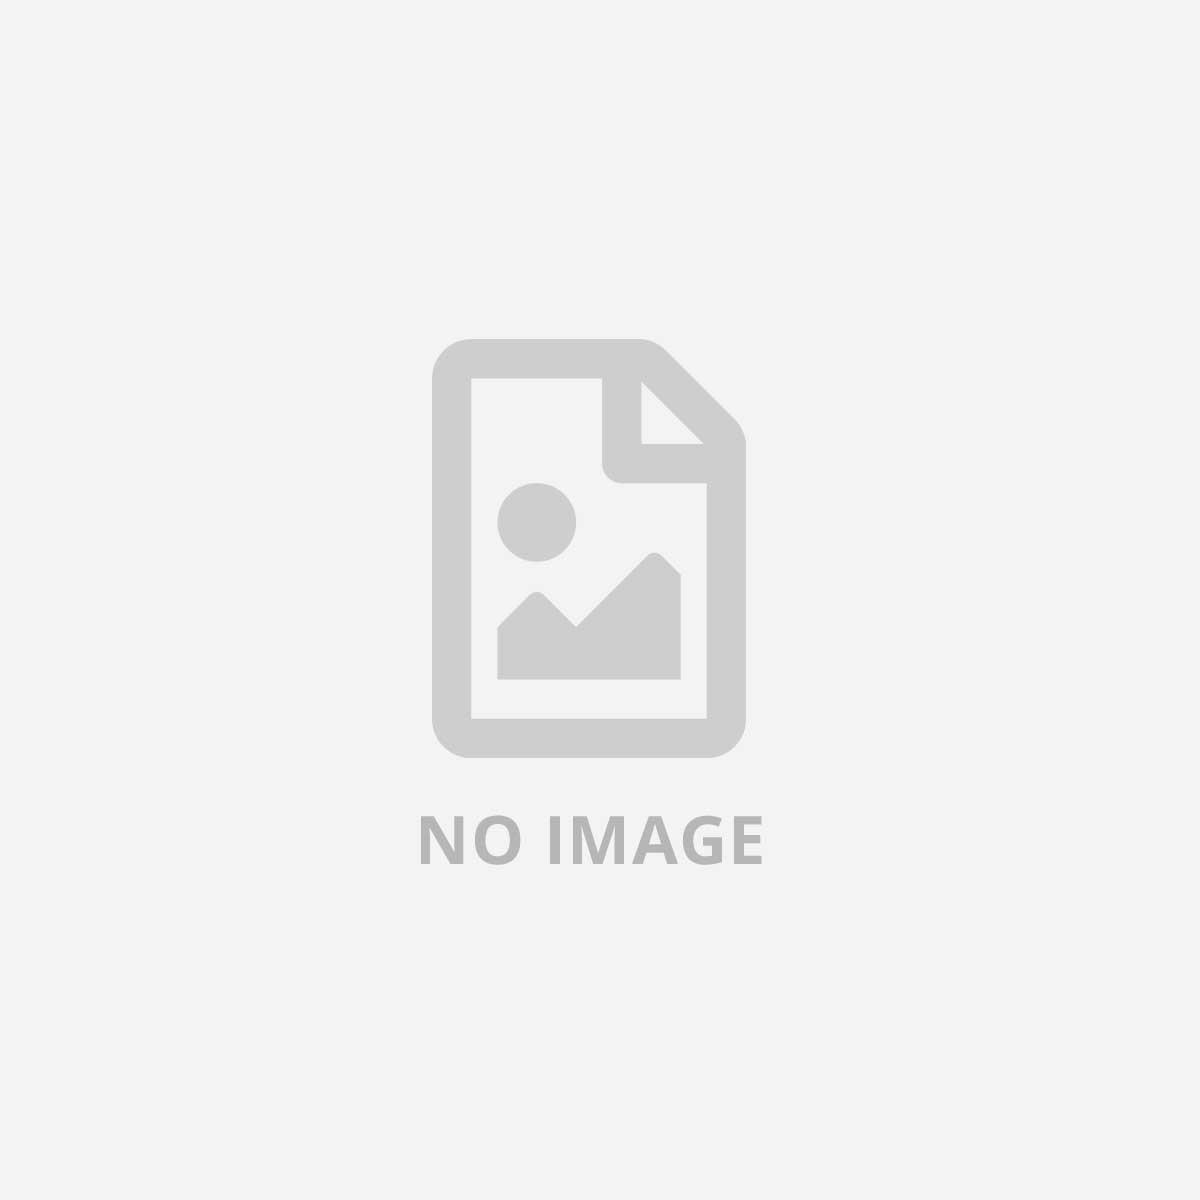 TRANSCEND SSD UPGRADE KIT